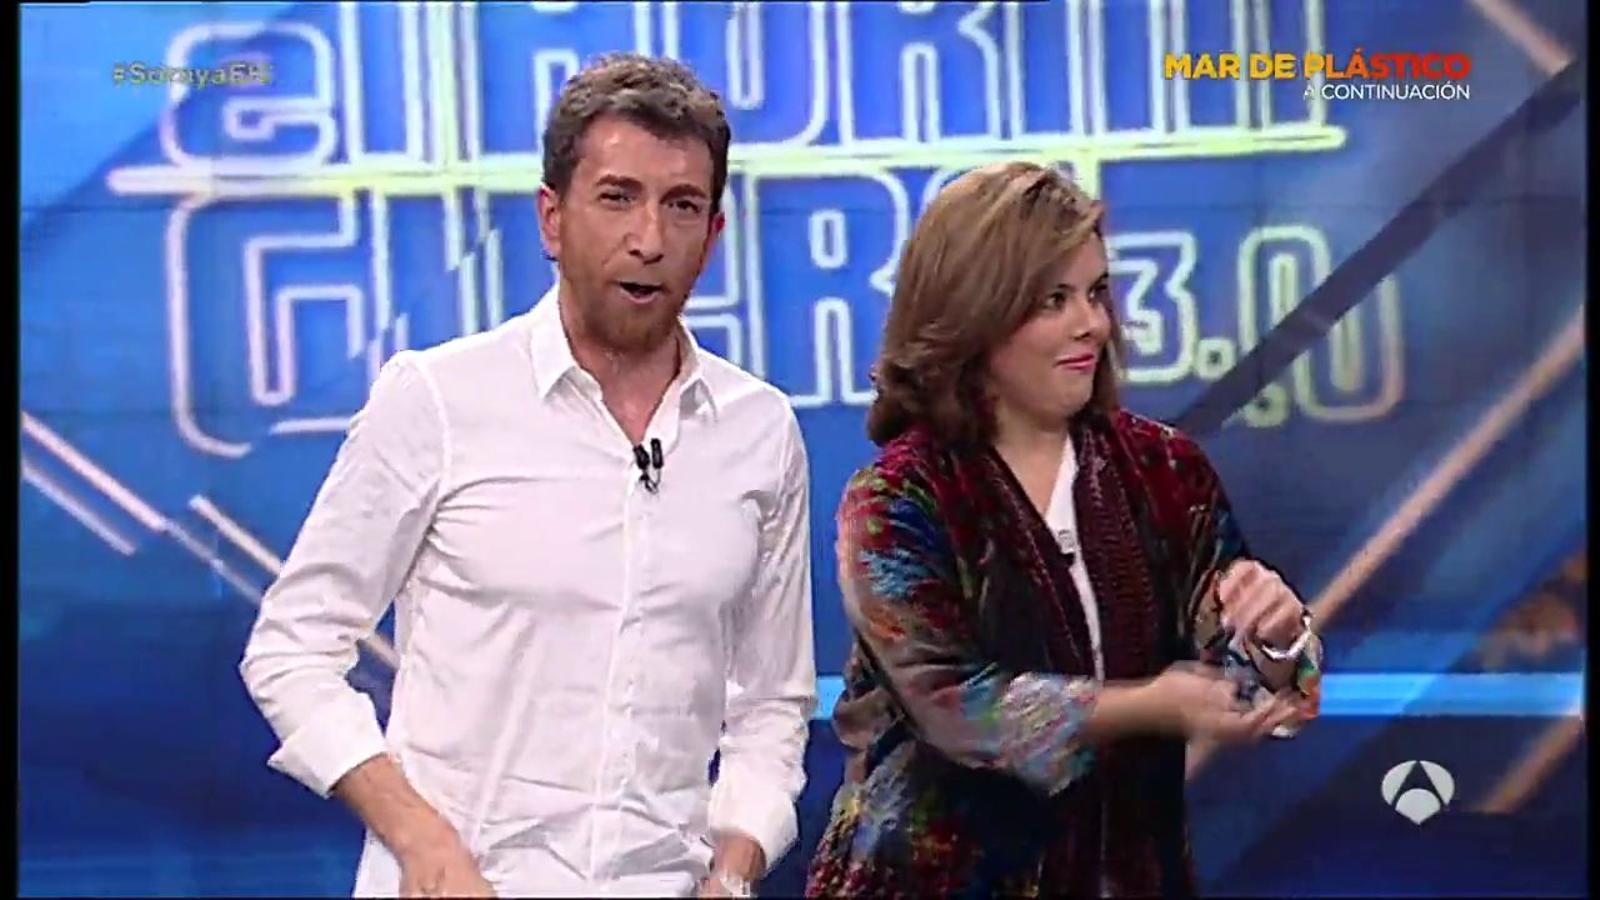 No només Iceta: Soraya Sáenz de Santamaría també balla